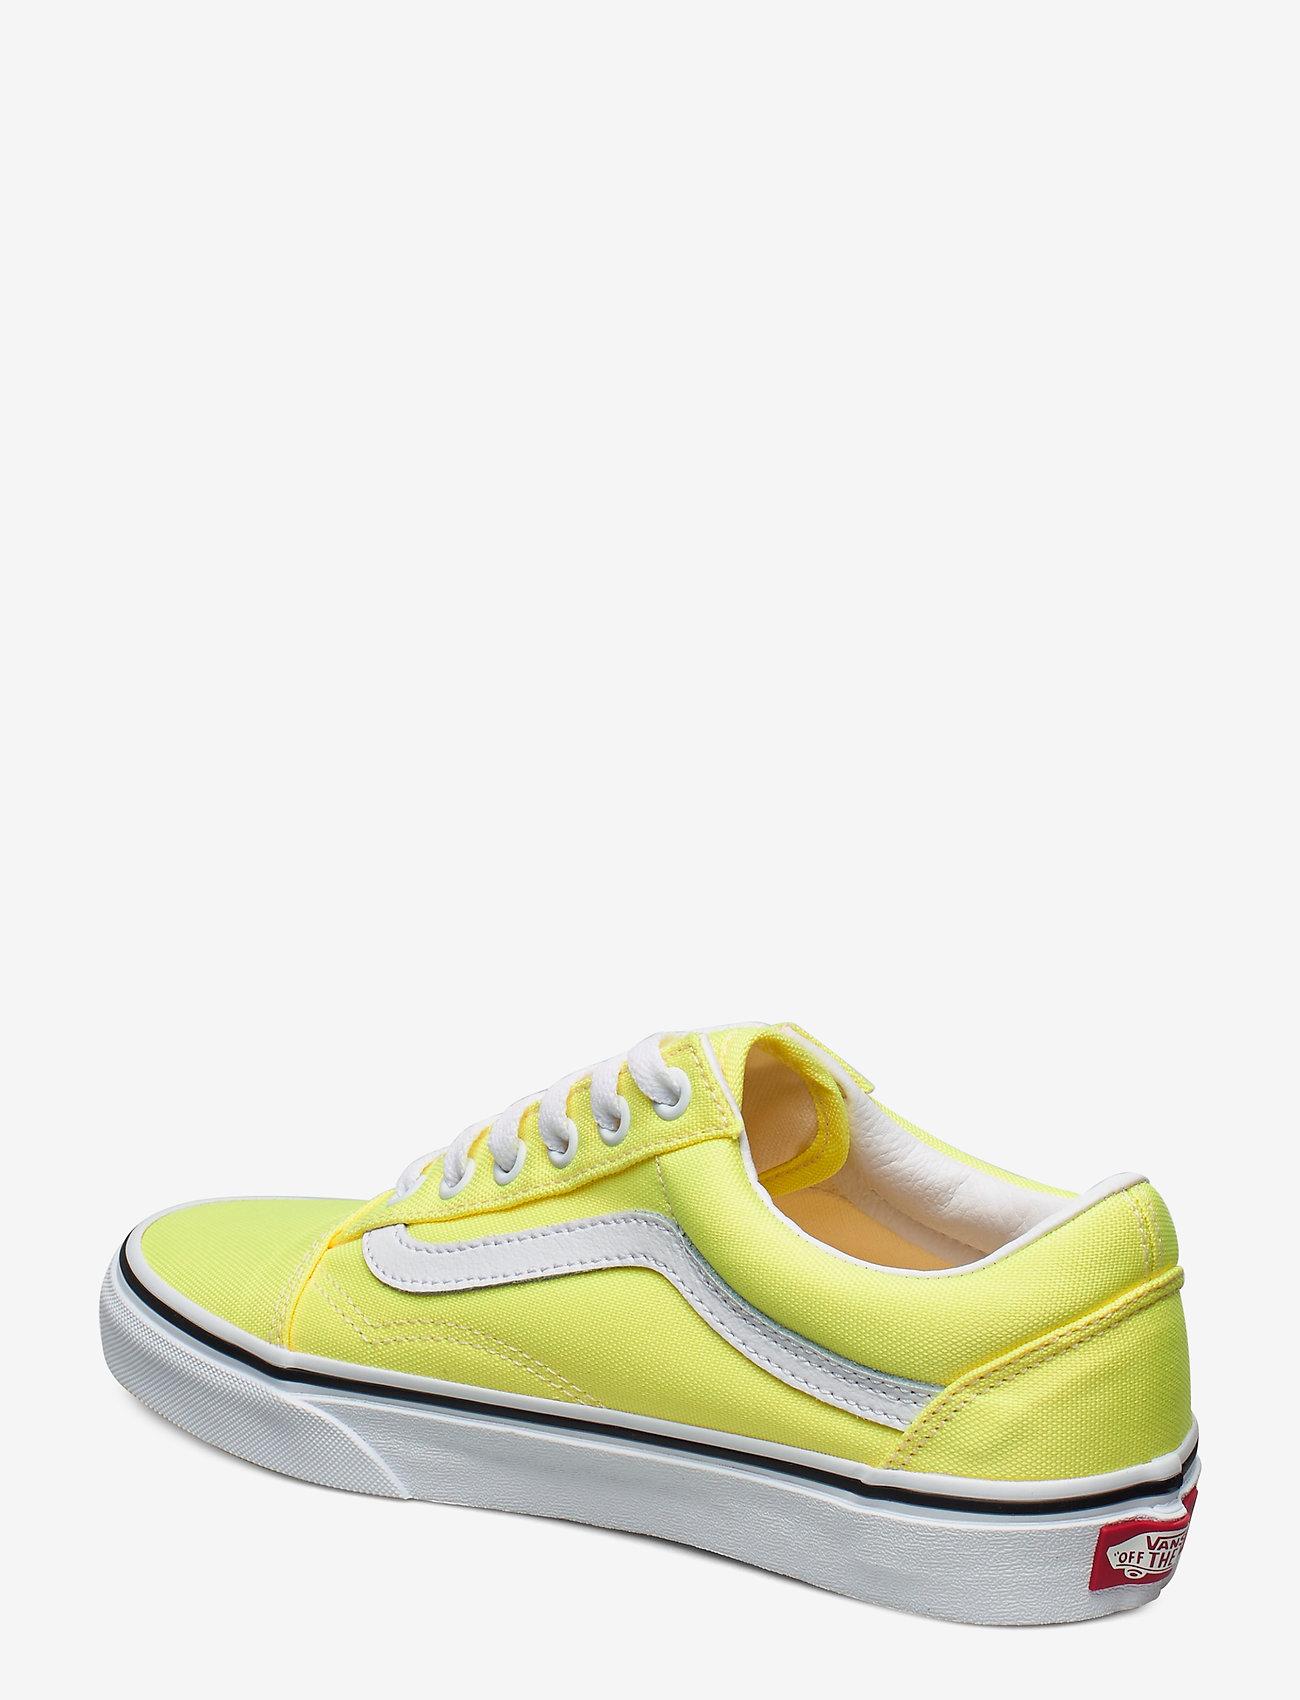 Ua Old Skool ((neon) Lemon Tonic/tr Wht) (60 €) - VANS LpPt9